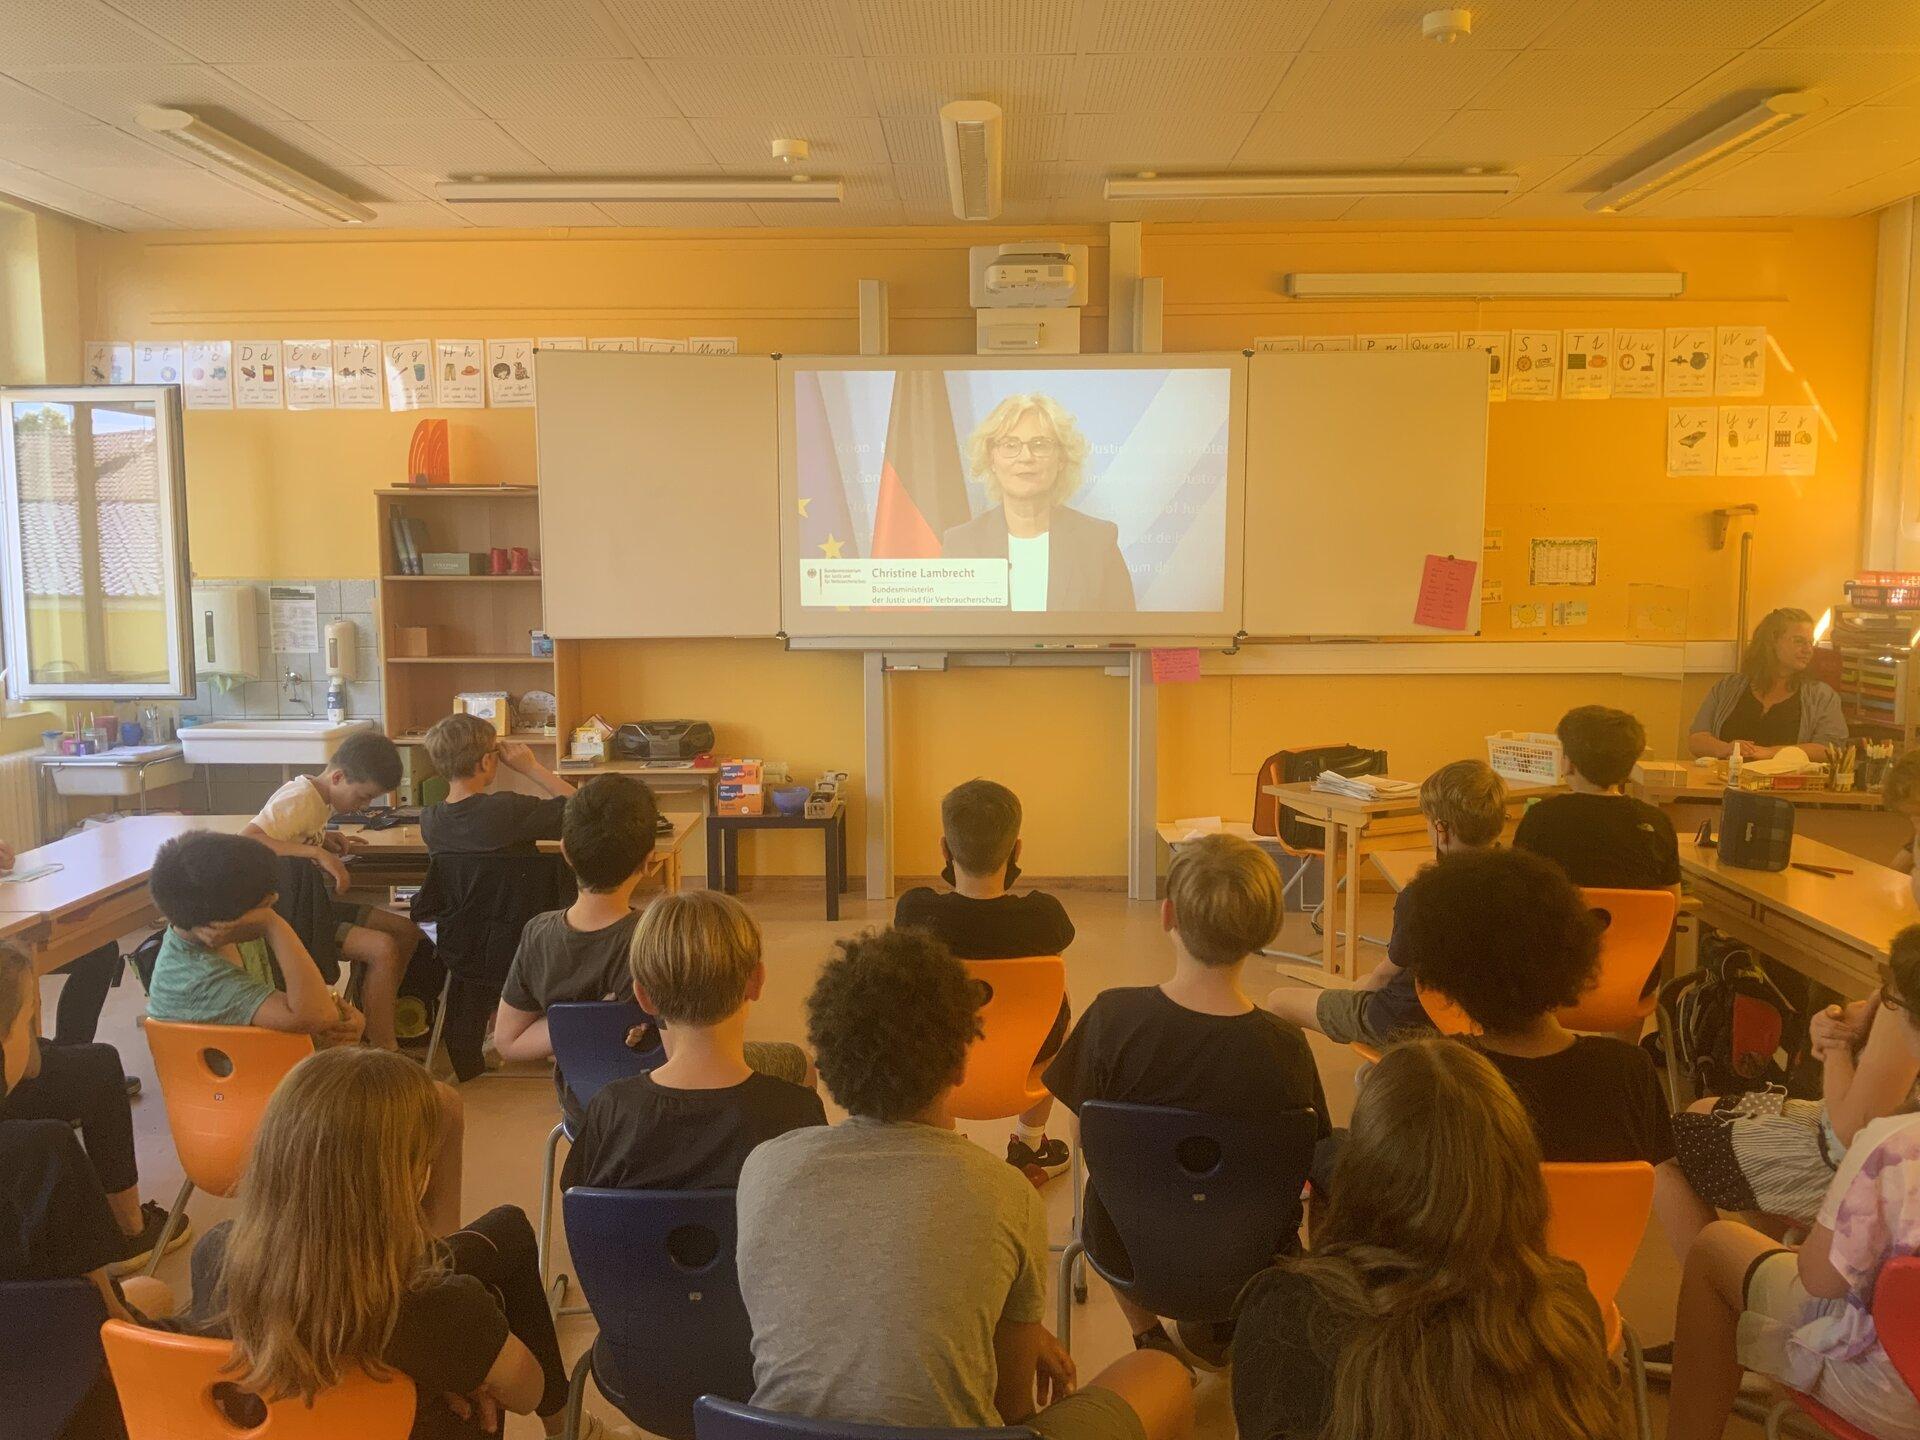 Digitale Eröffnung des Anne Frank Tages am 11. 6.2021 mit Bundesjustizministerin